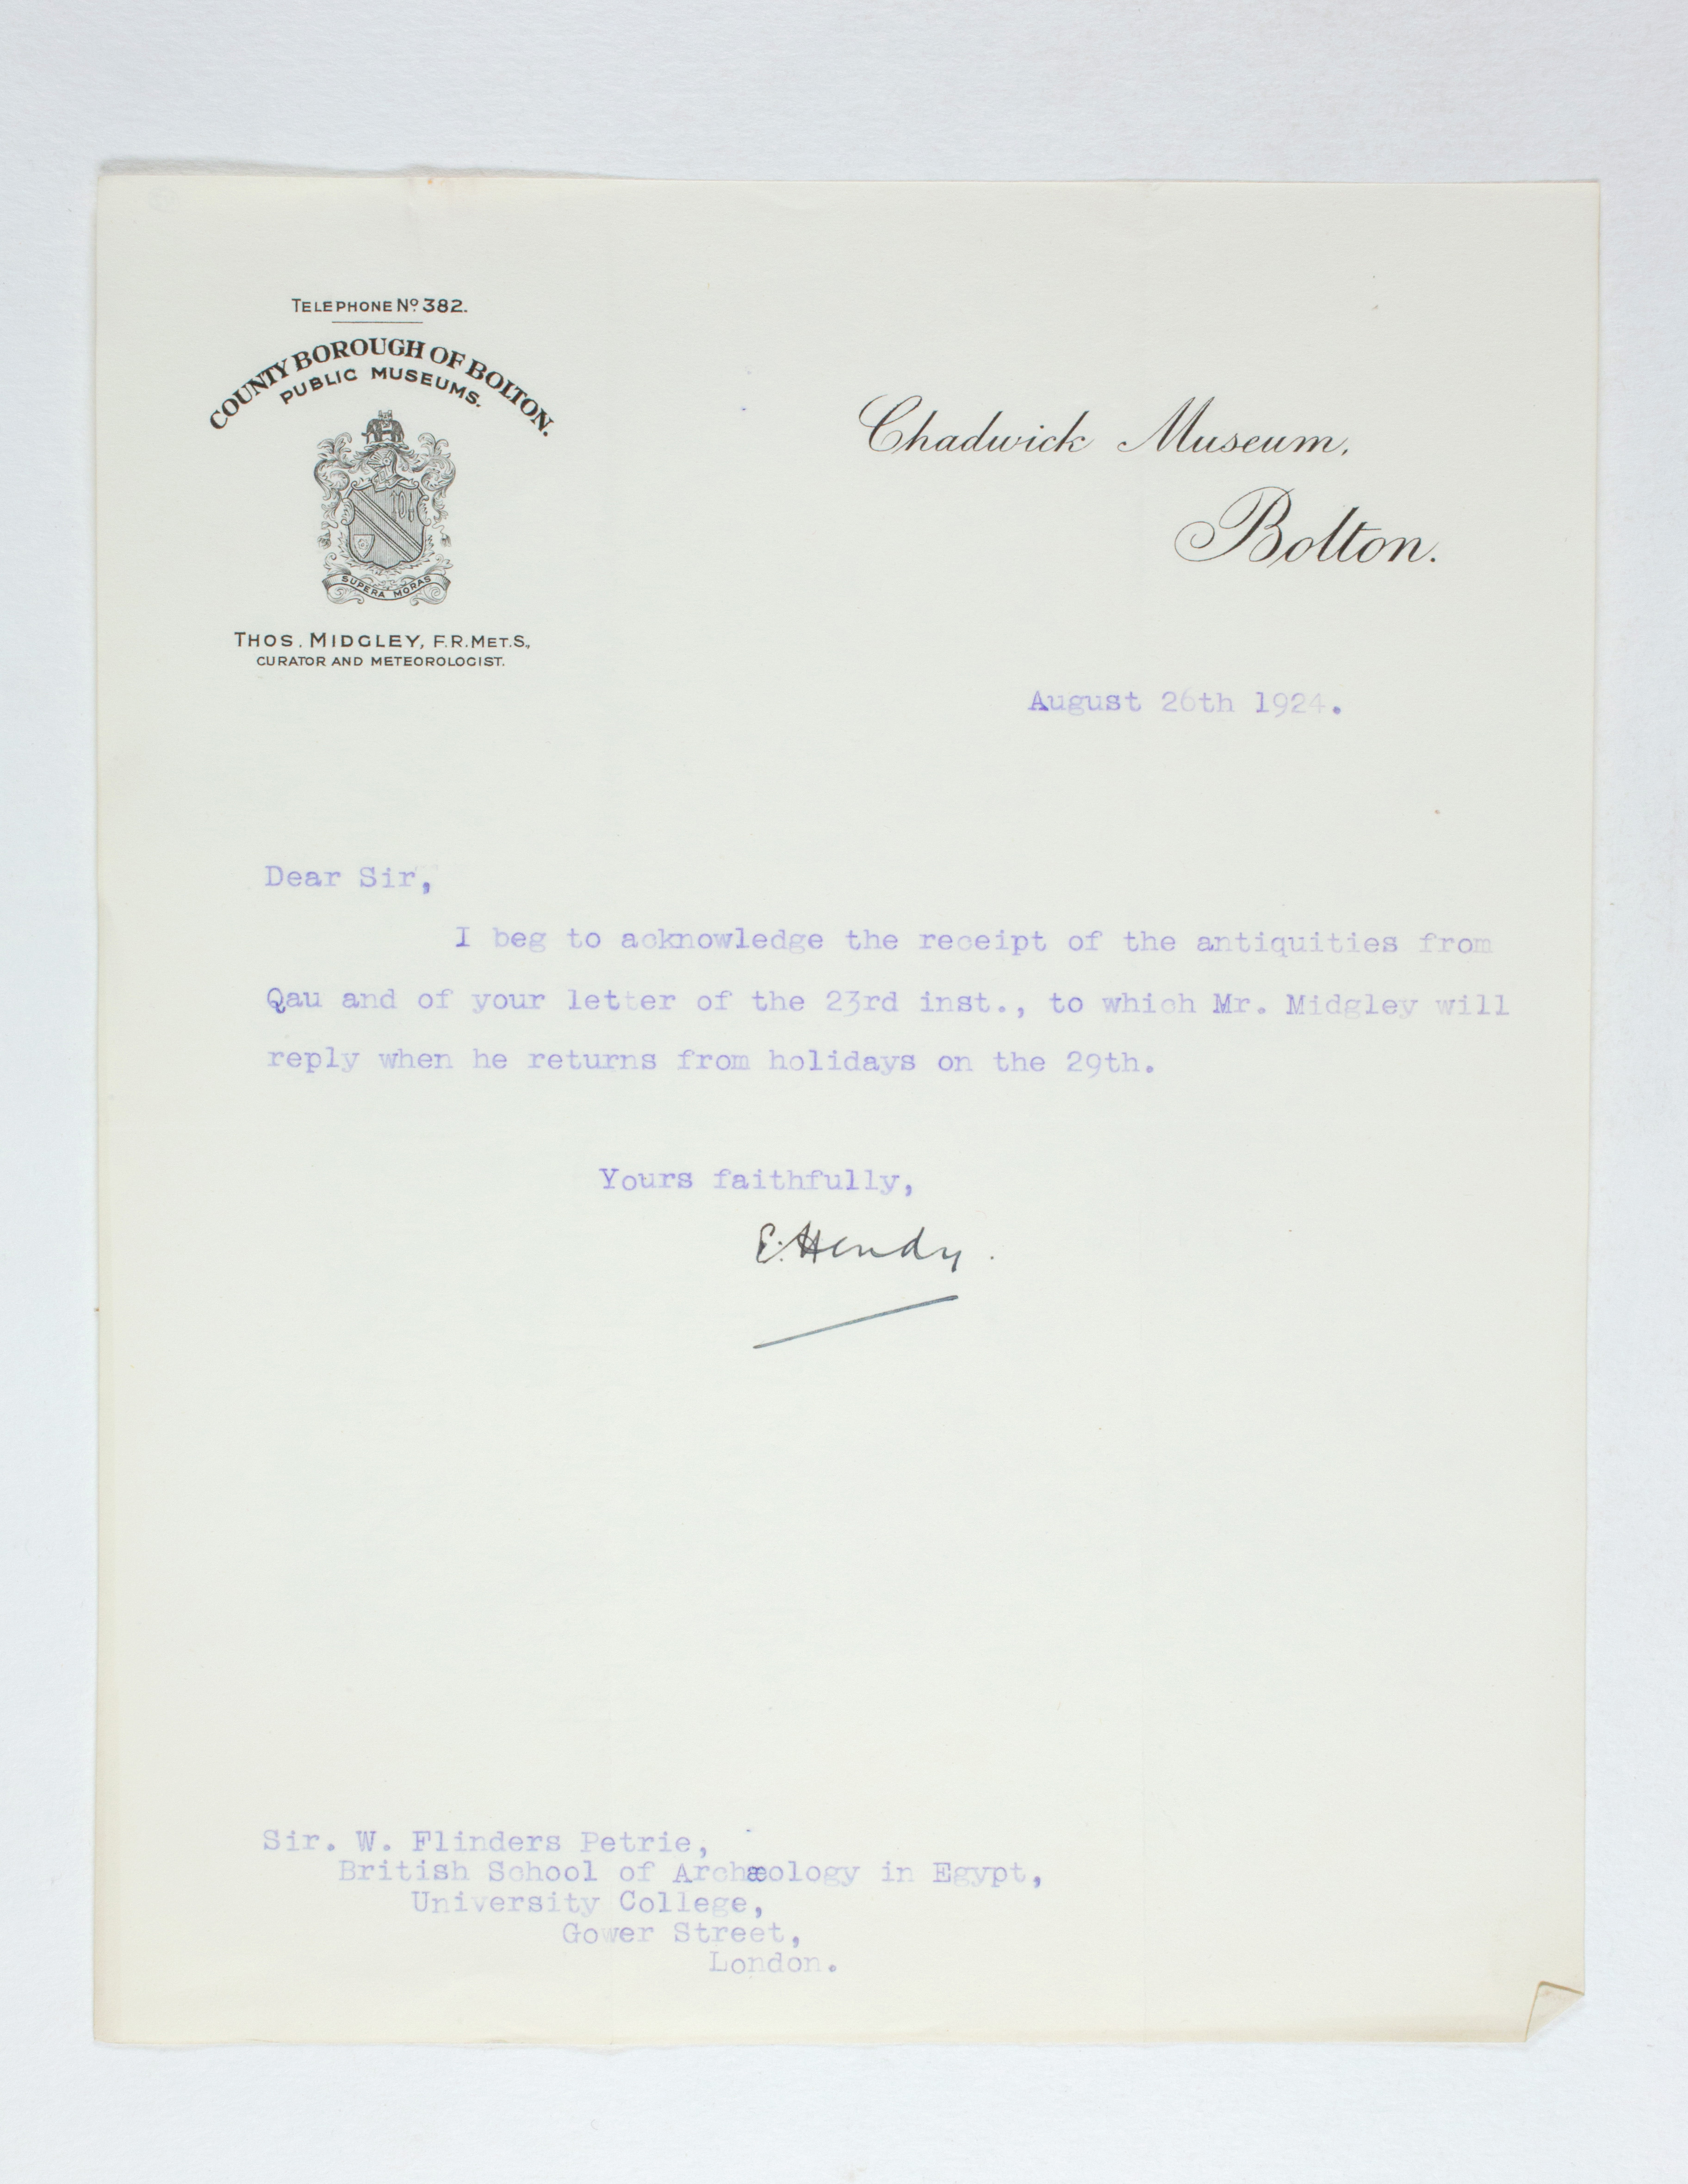 1923-24 Qau el-Kebir, Hemamieh Receipt from institution  PMA/WFP1/D/27/42